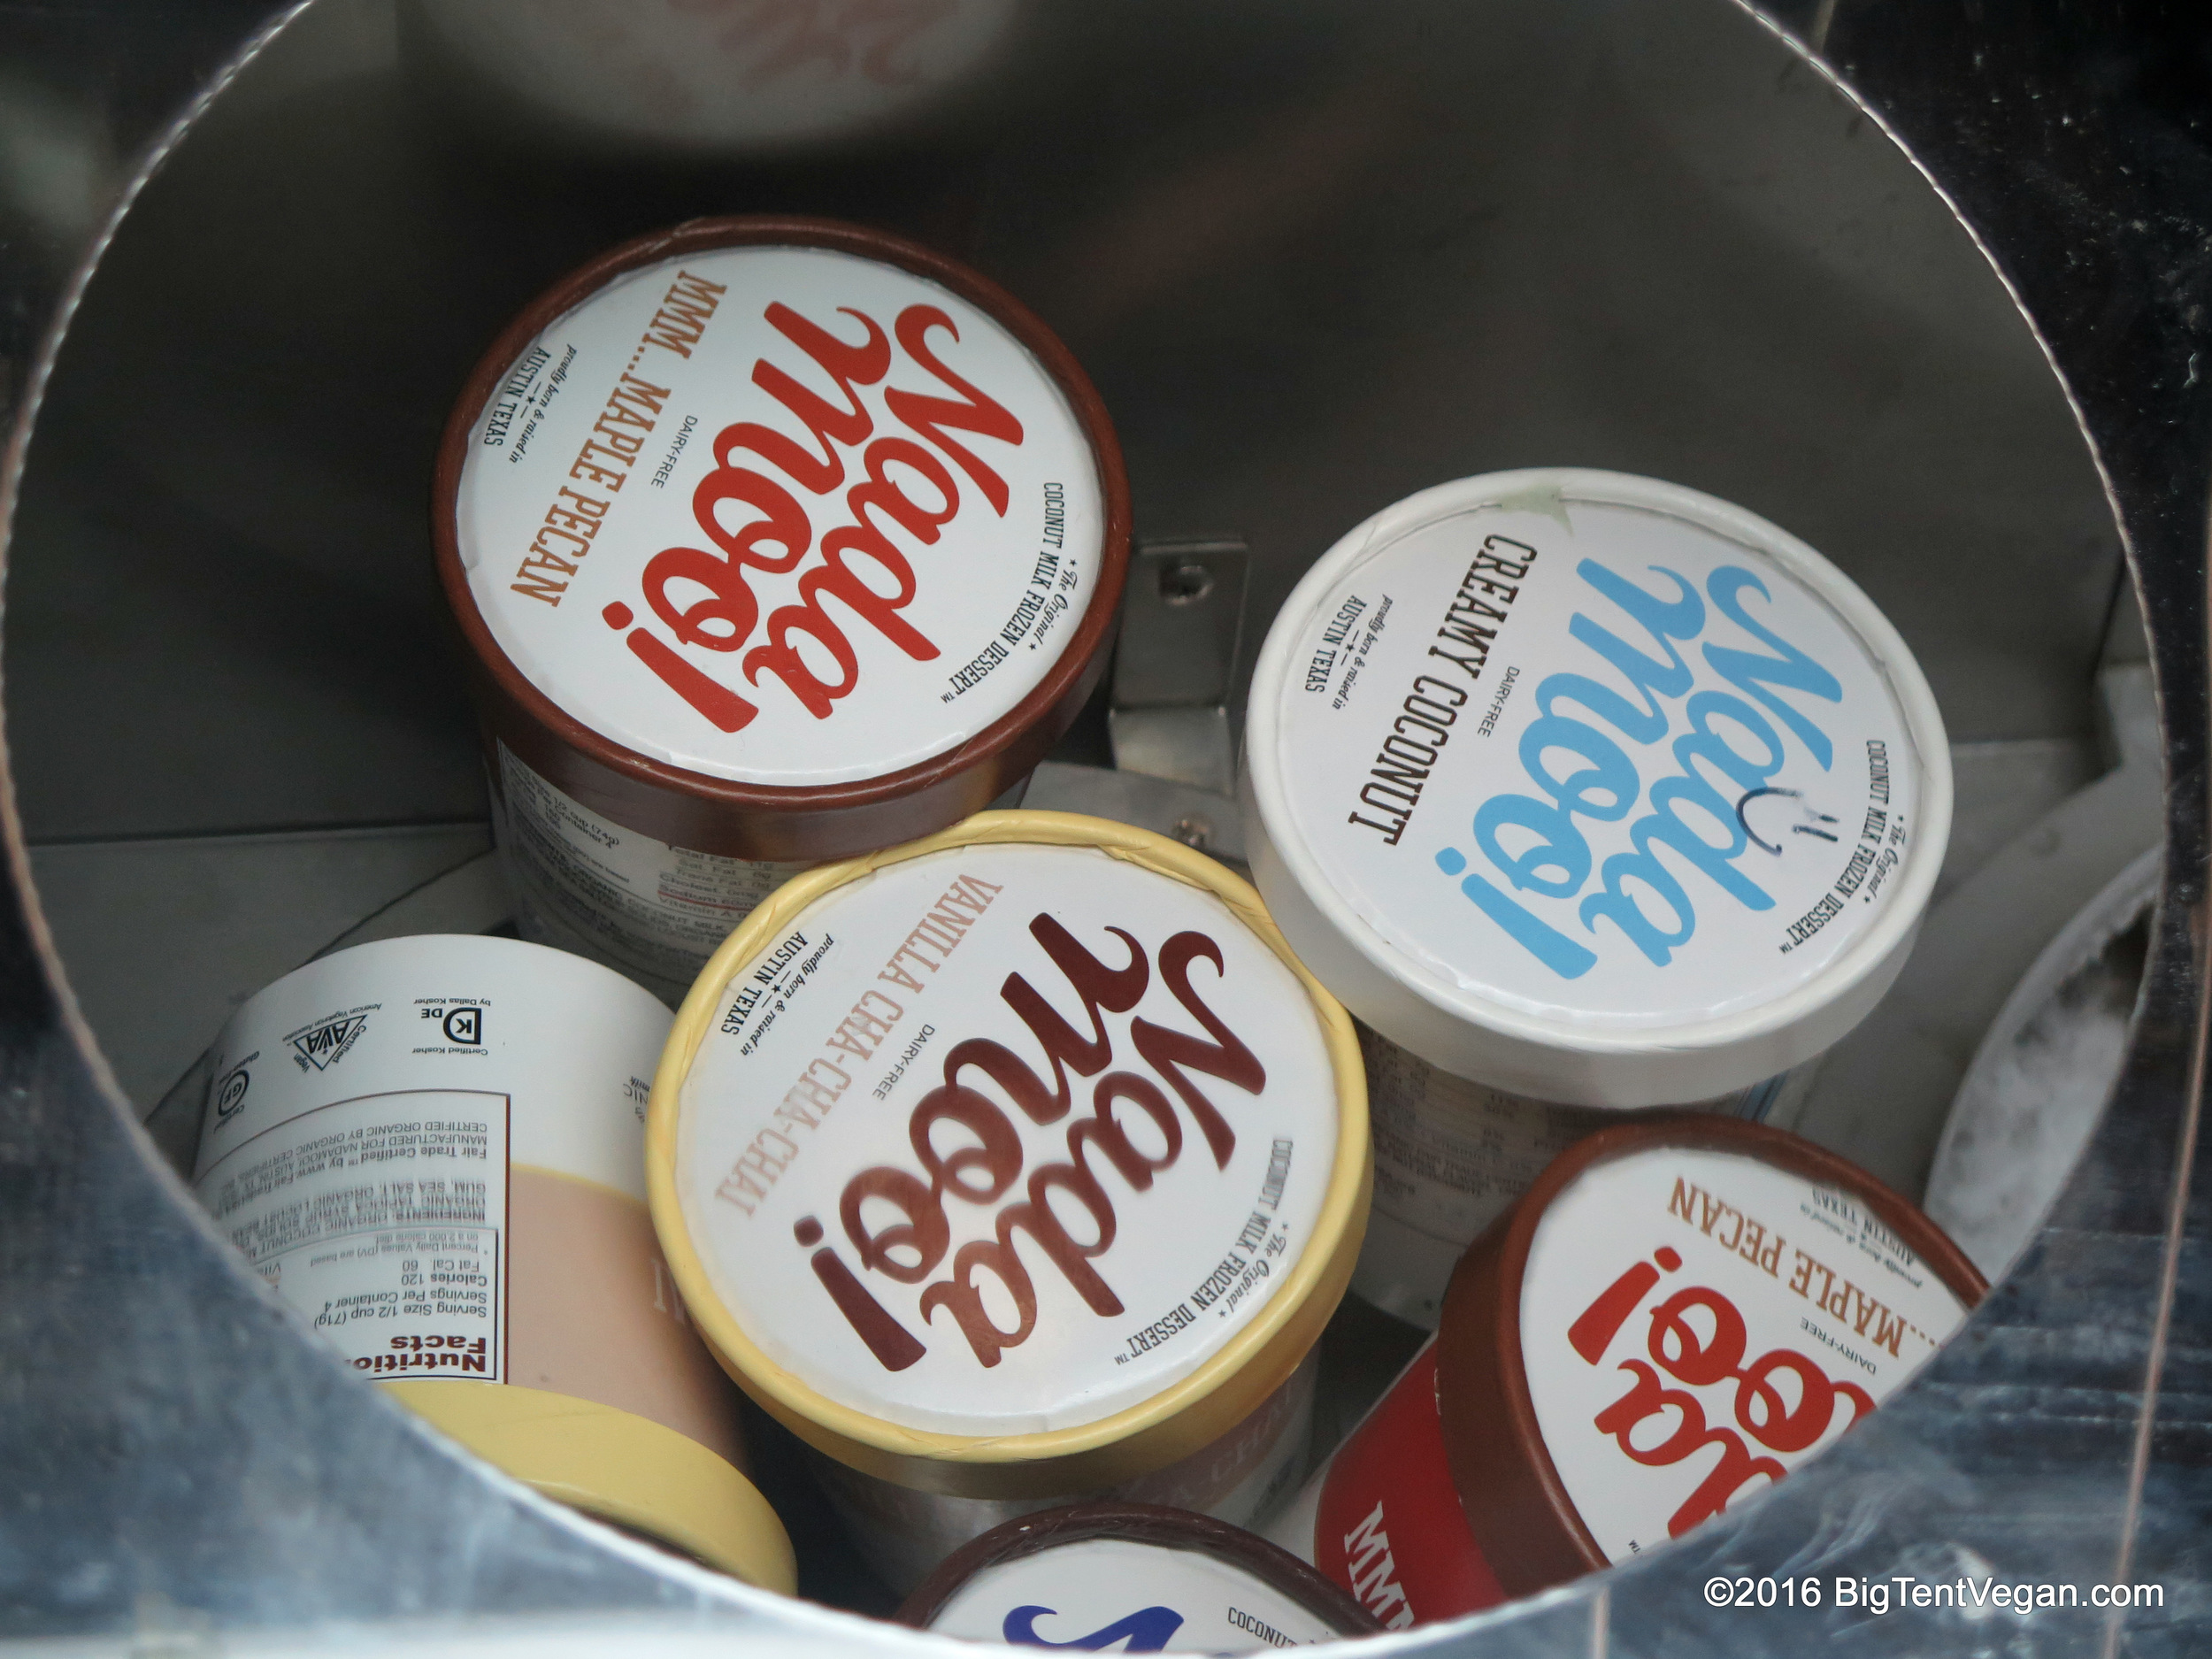 Lots of great vegan ice cream options on the market --I especially liked the coconut-milk-based NadaMoo.